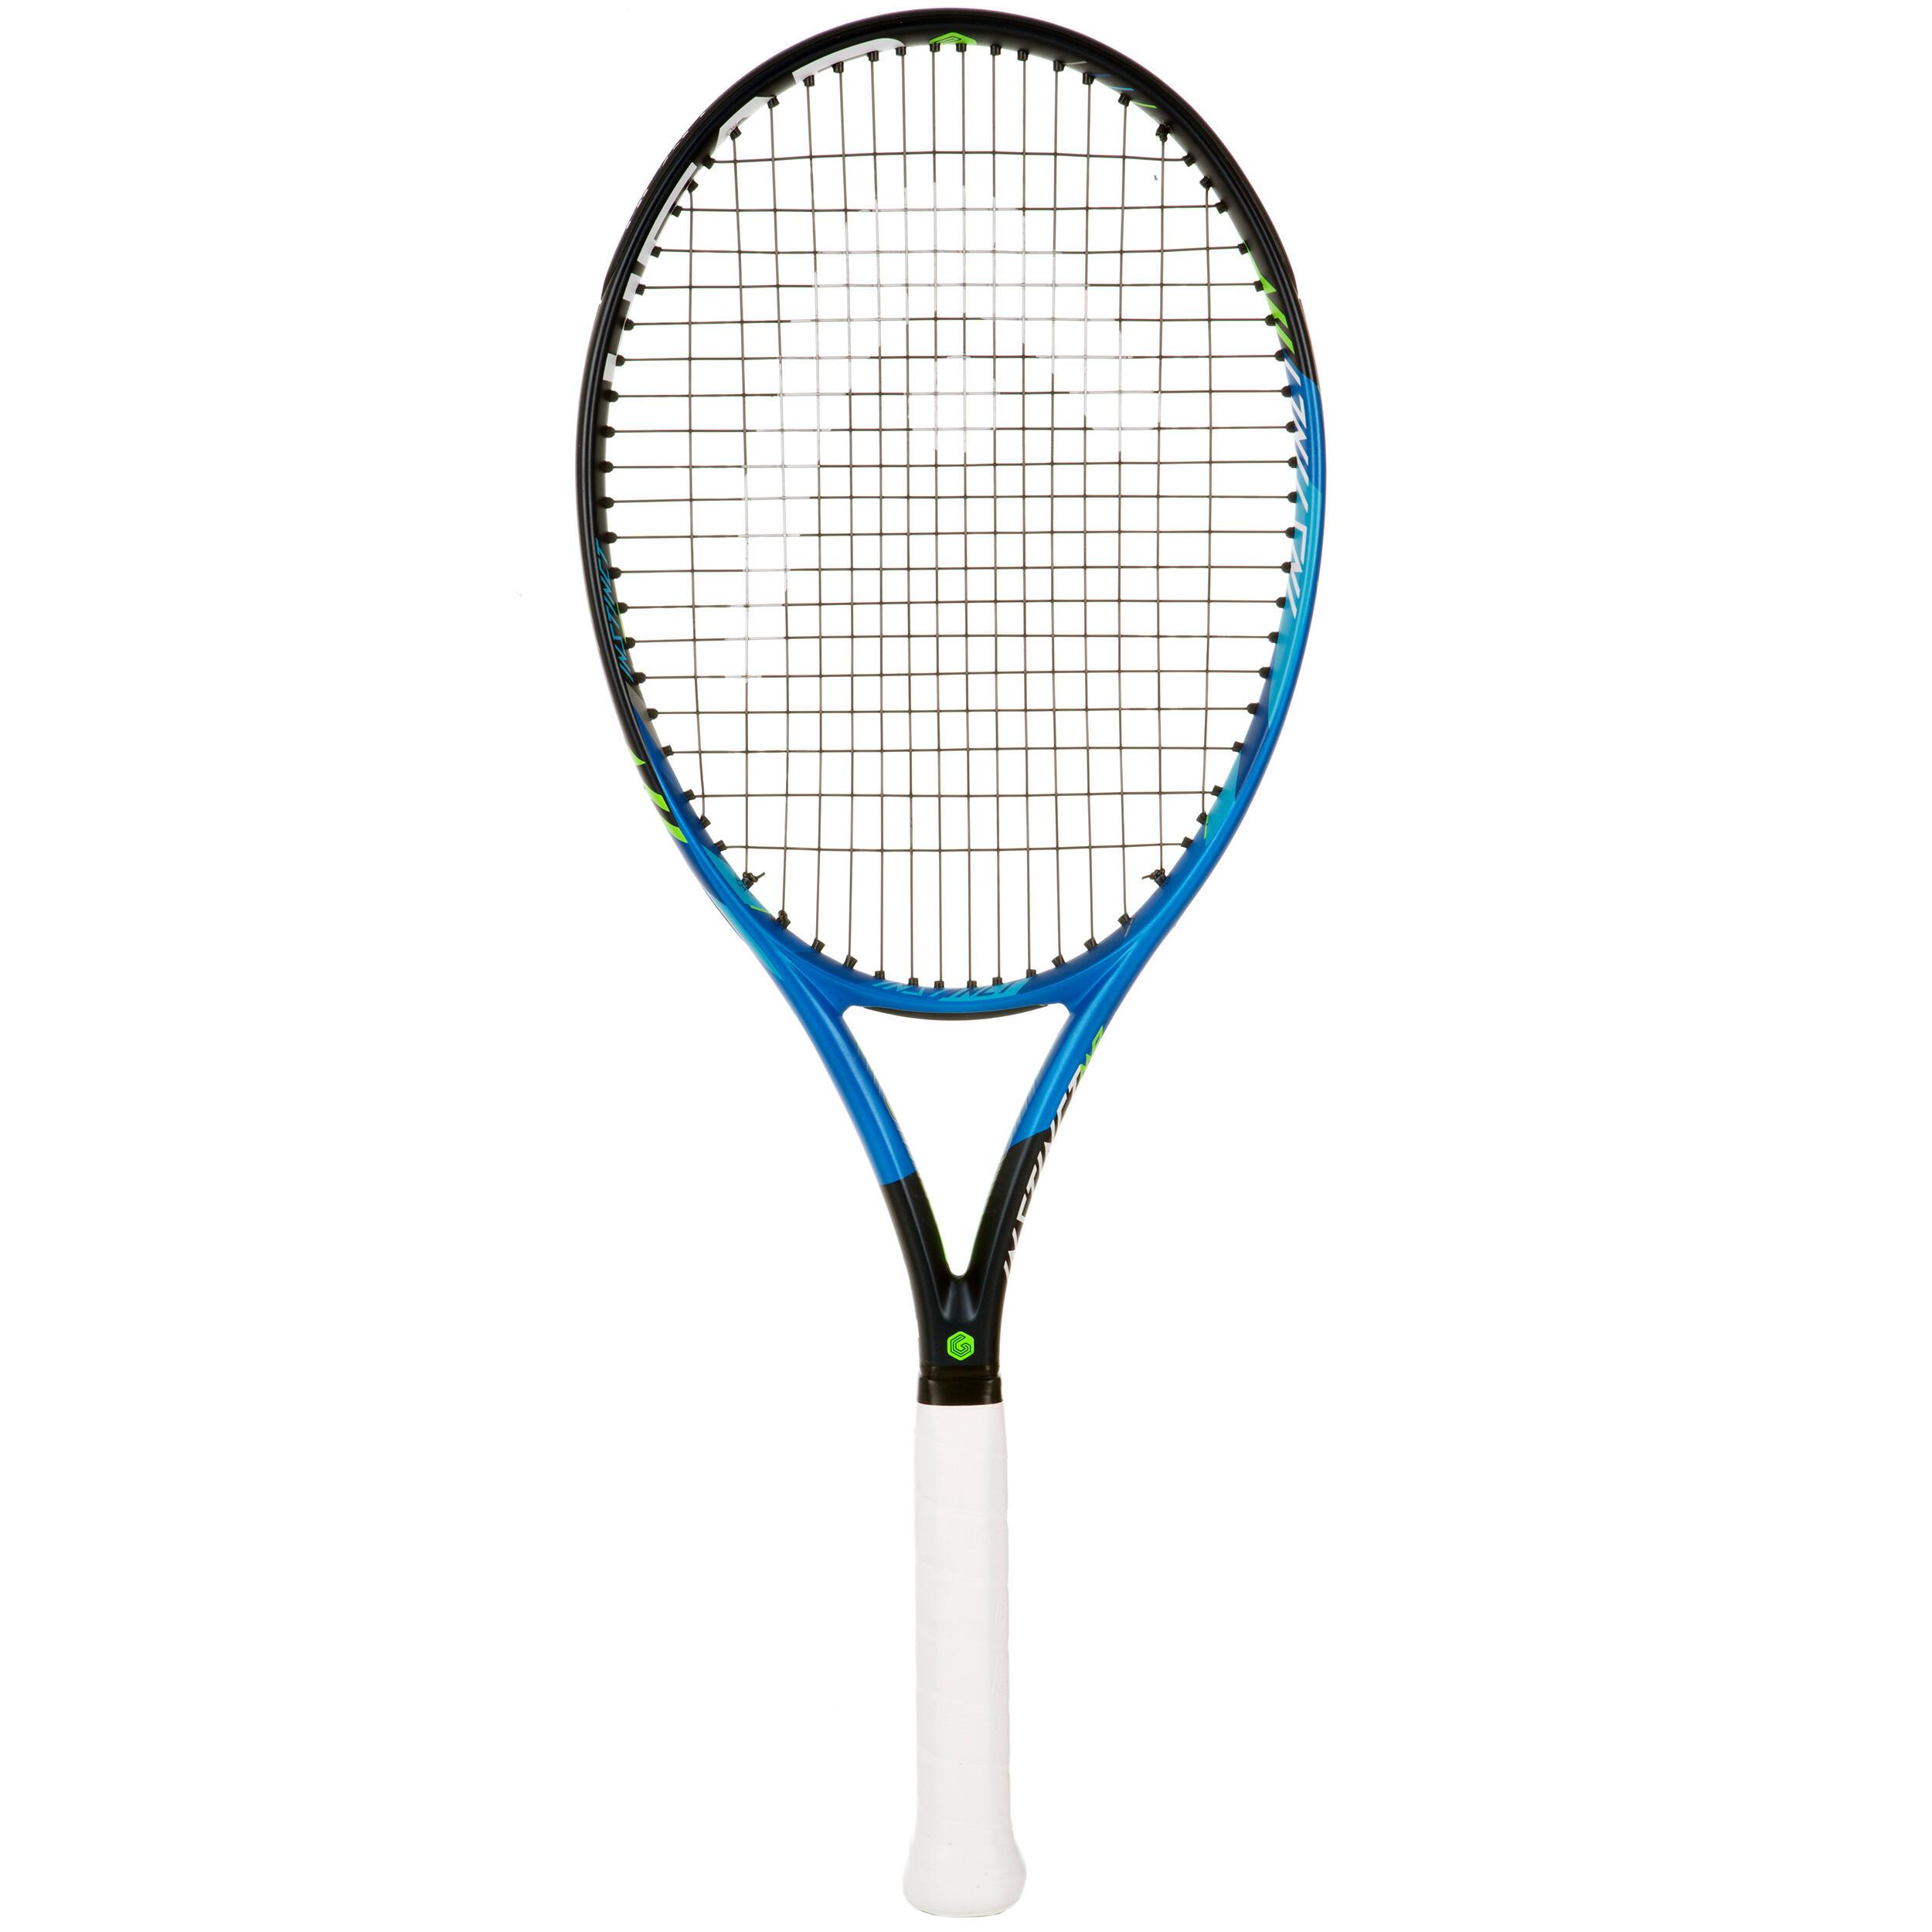 Head Tennisracket Instinct MP blauw/zwart